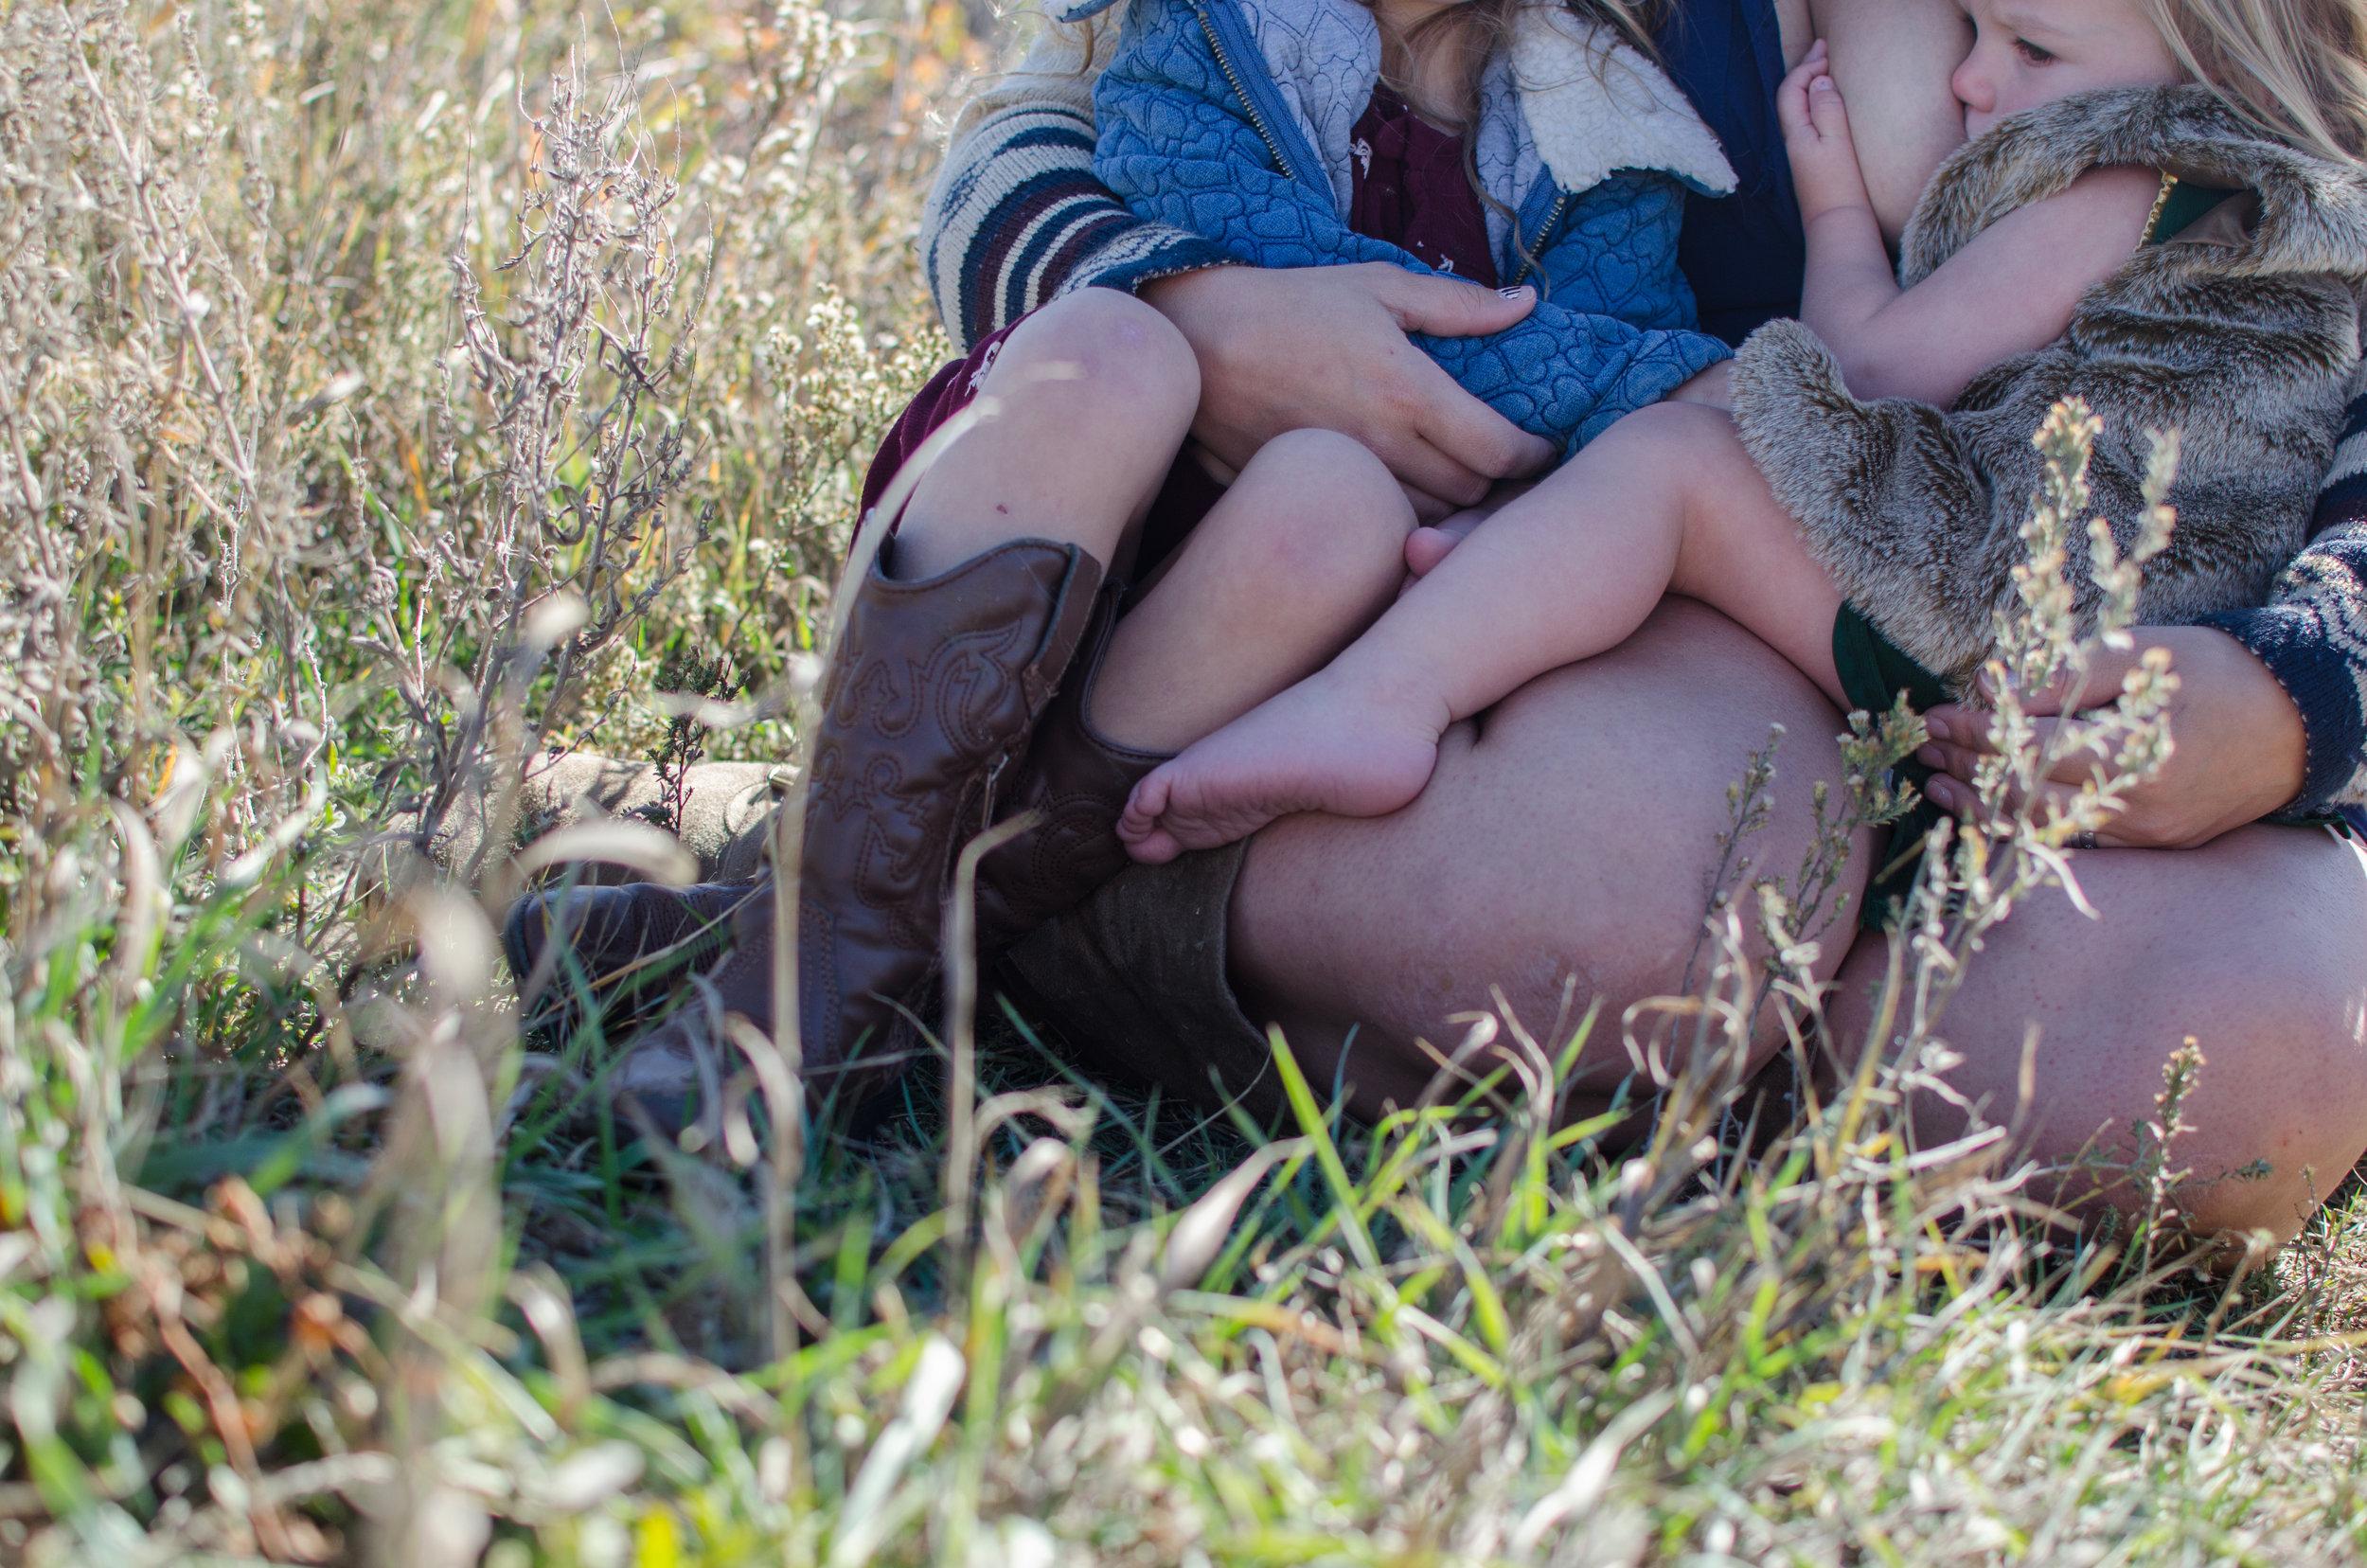 breastfeeding details, learn to breastfeed, colorado mom